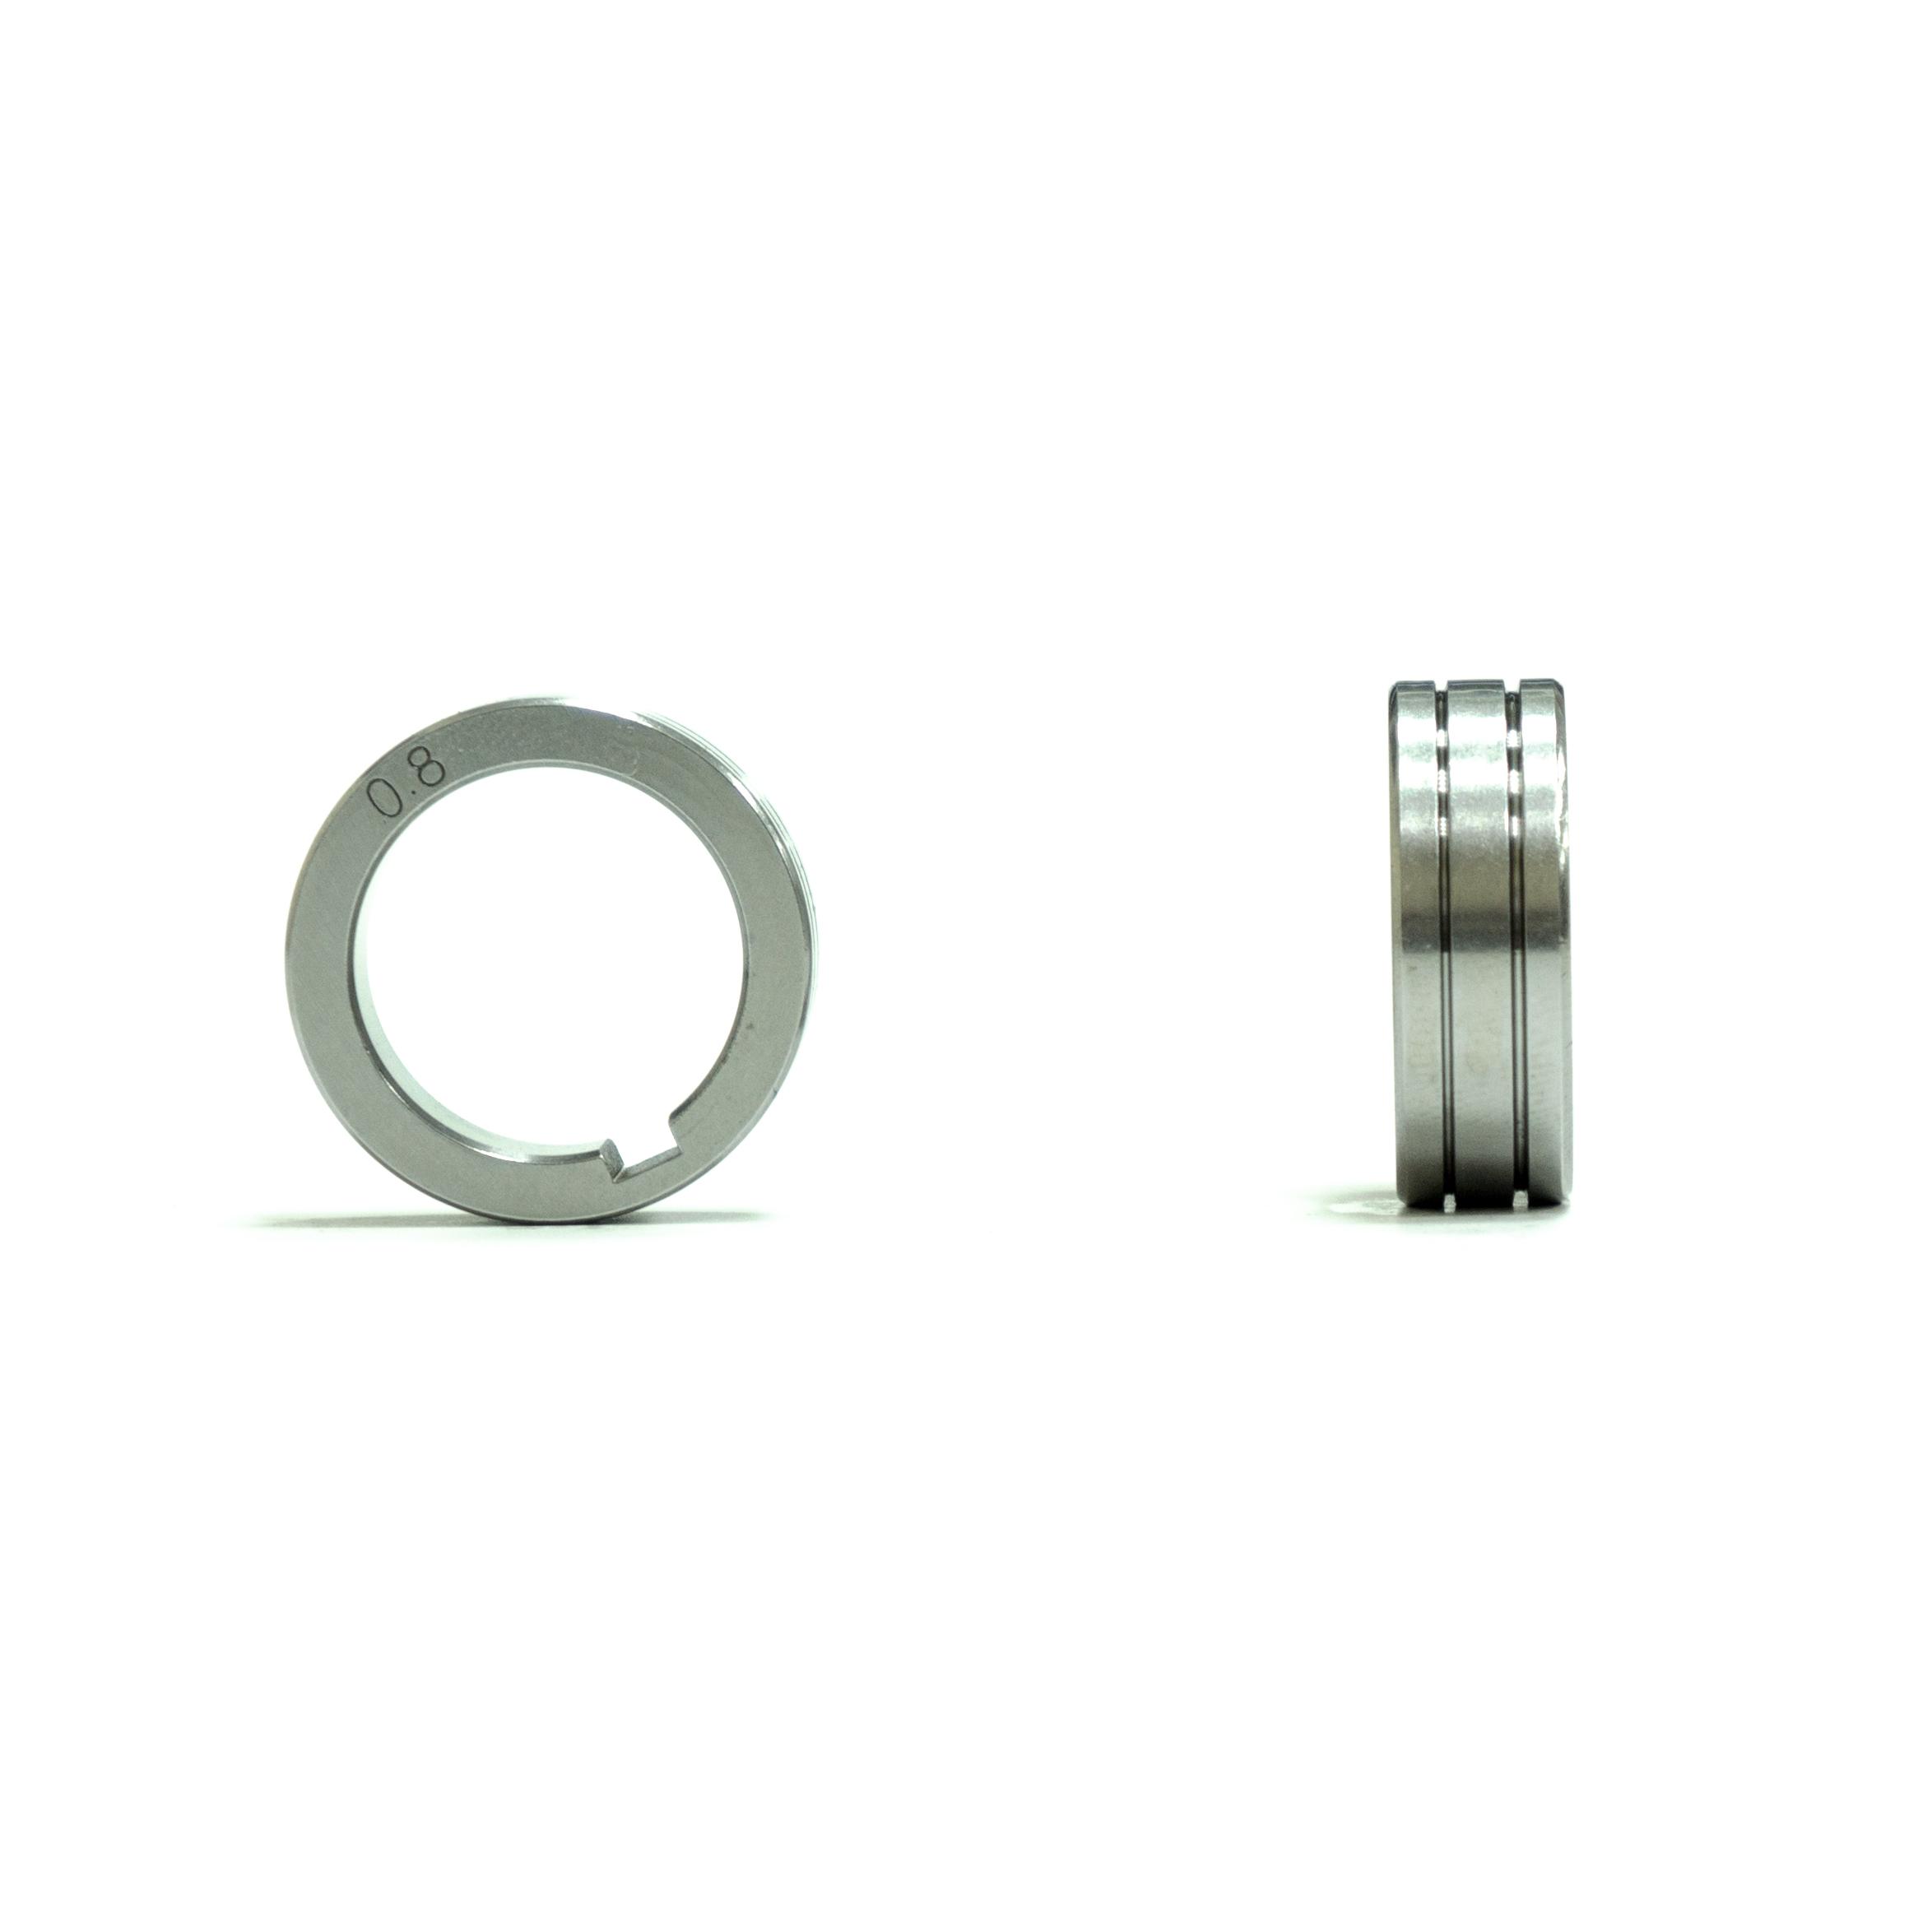 Ролик сталь 0.6-0.8мм /SPEEDWAY 200-250-300 OVERMAN 160-180-200-250-250/3